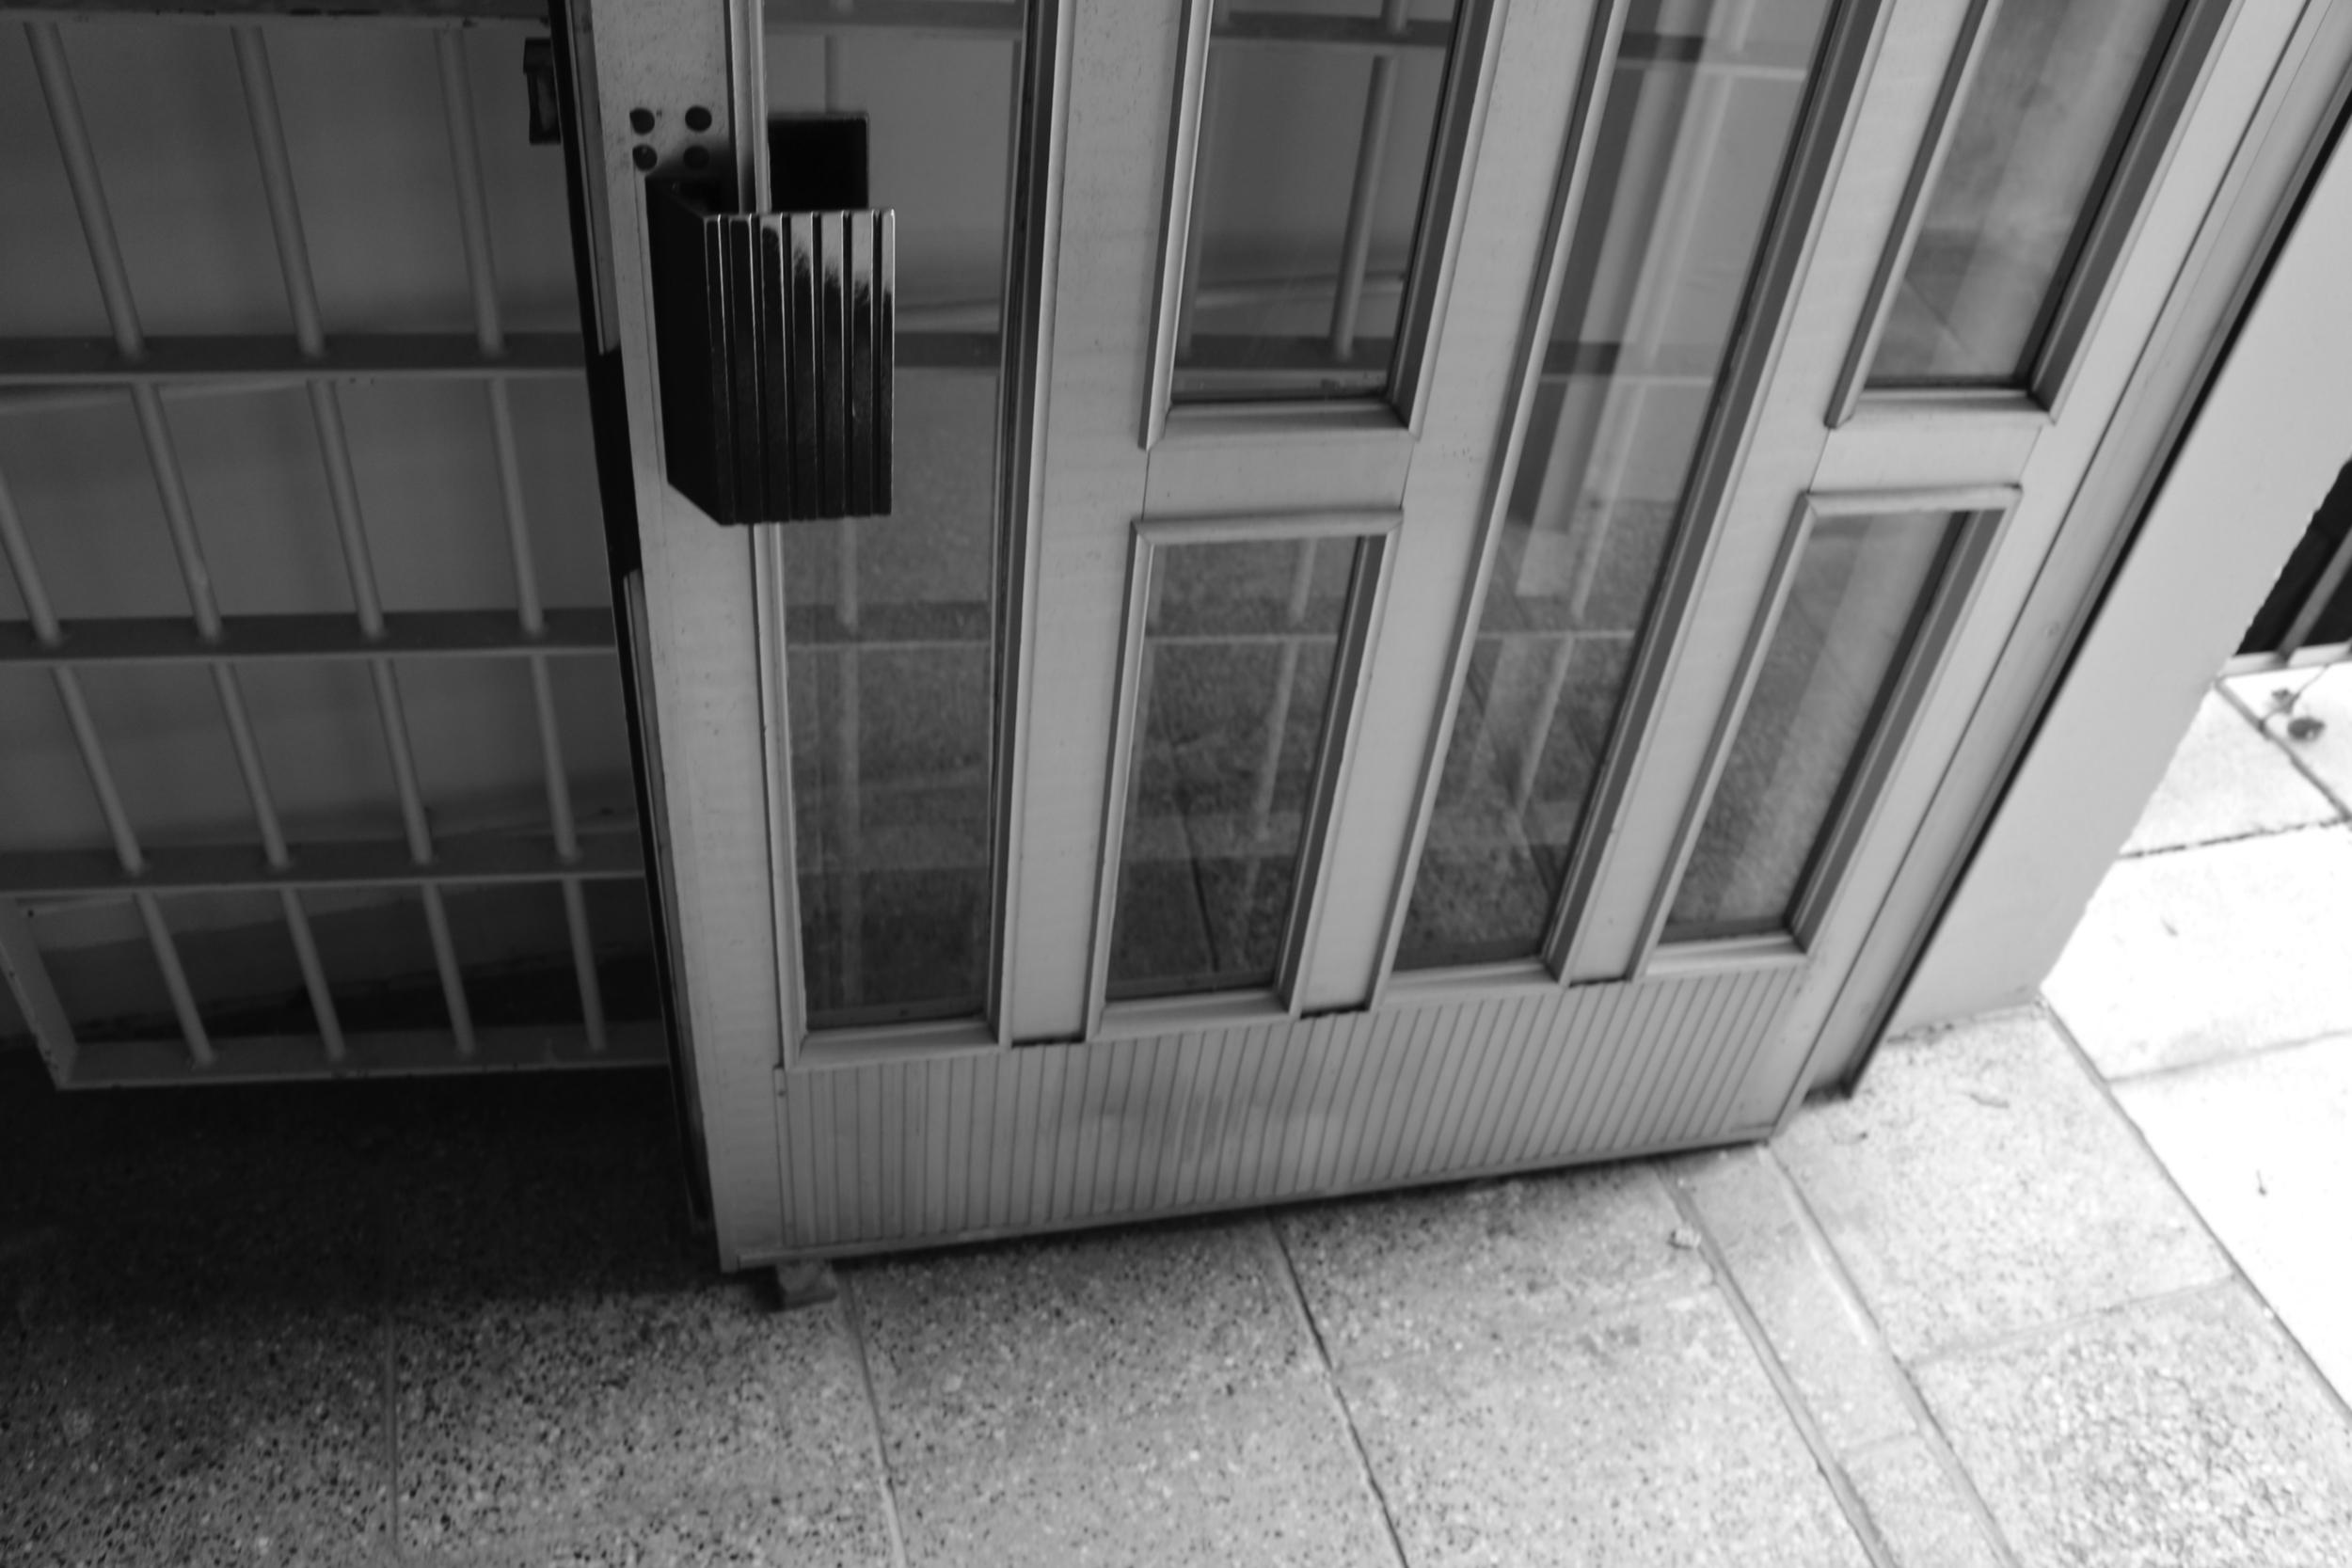 prison-door-naumburg-stasi-prison.jpg